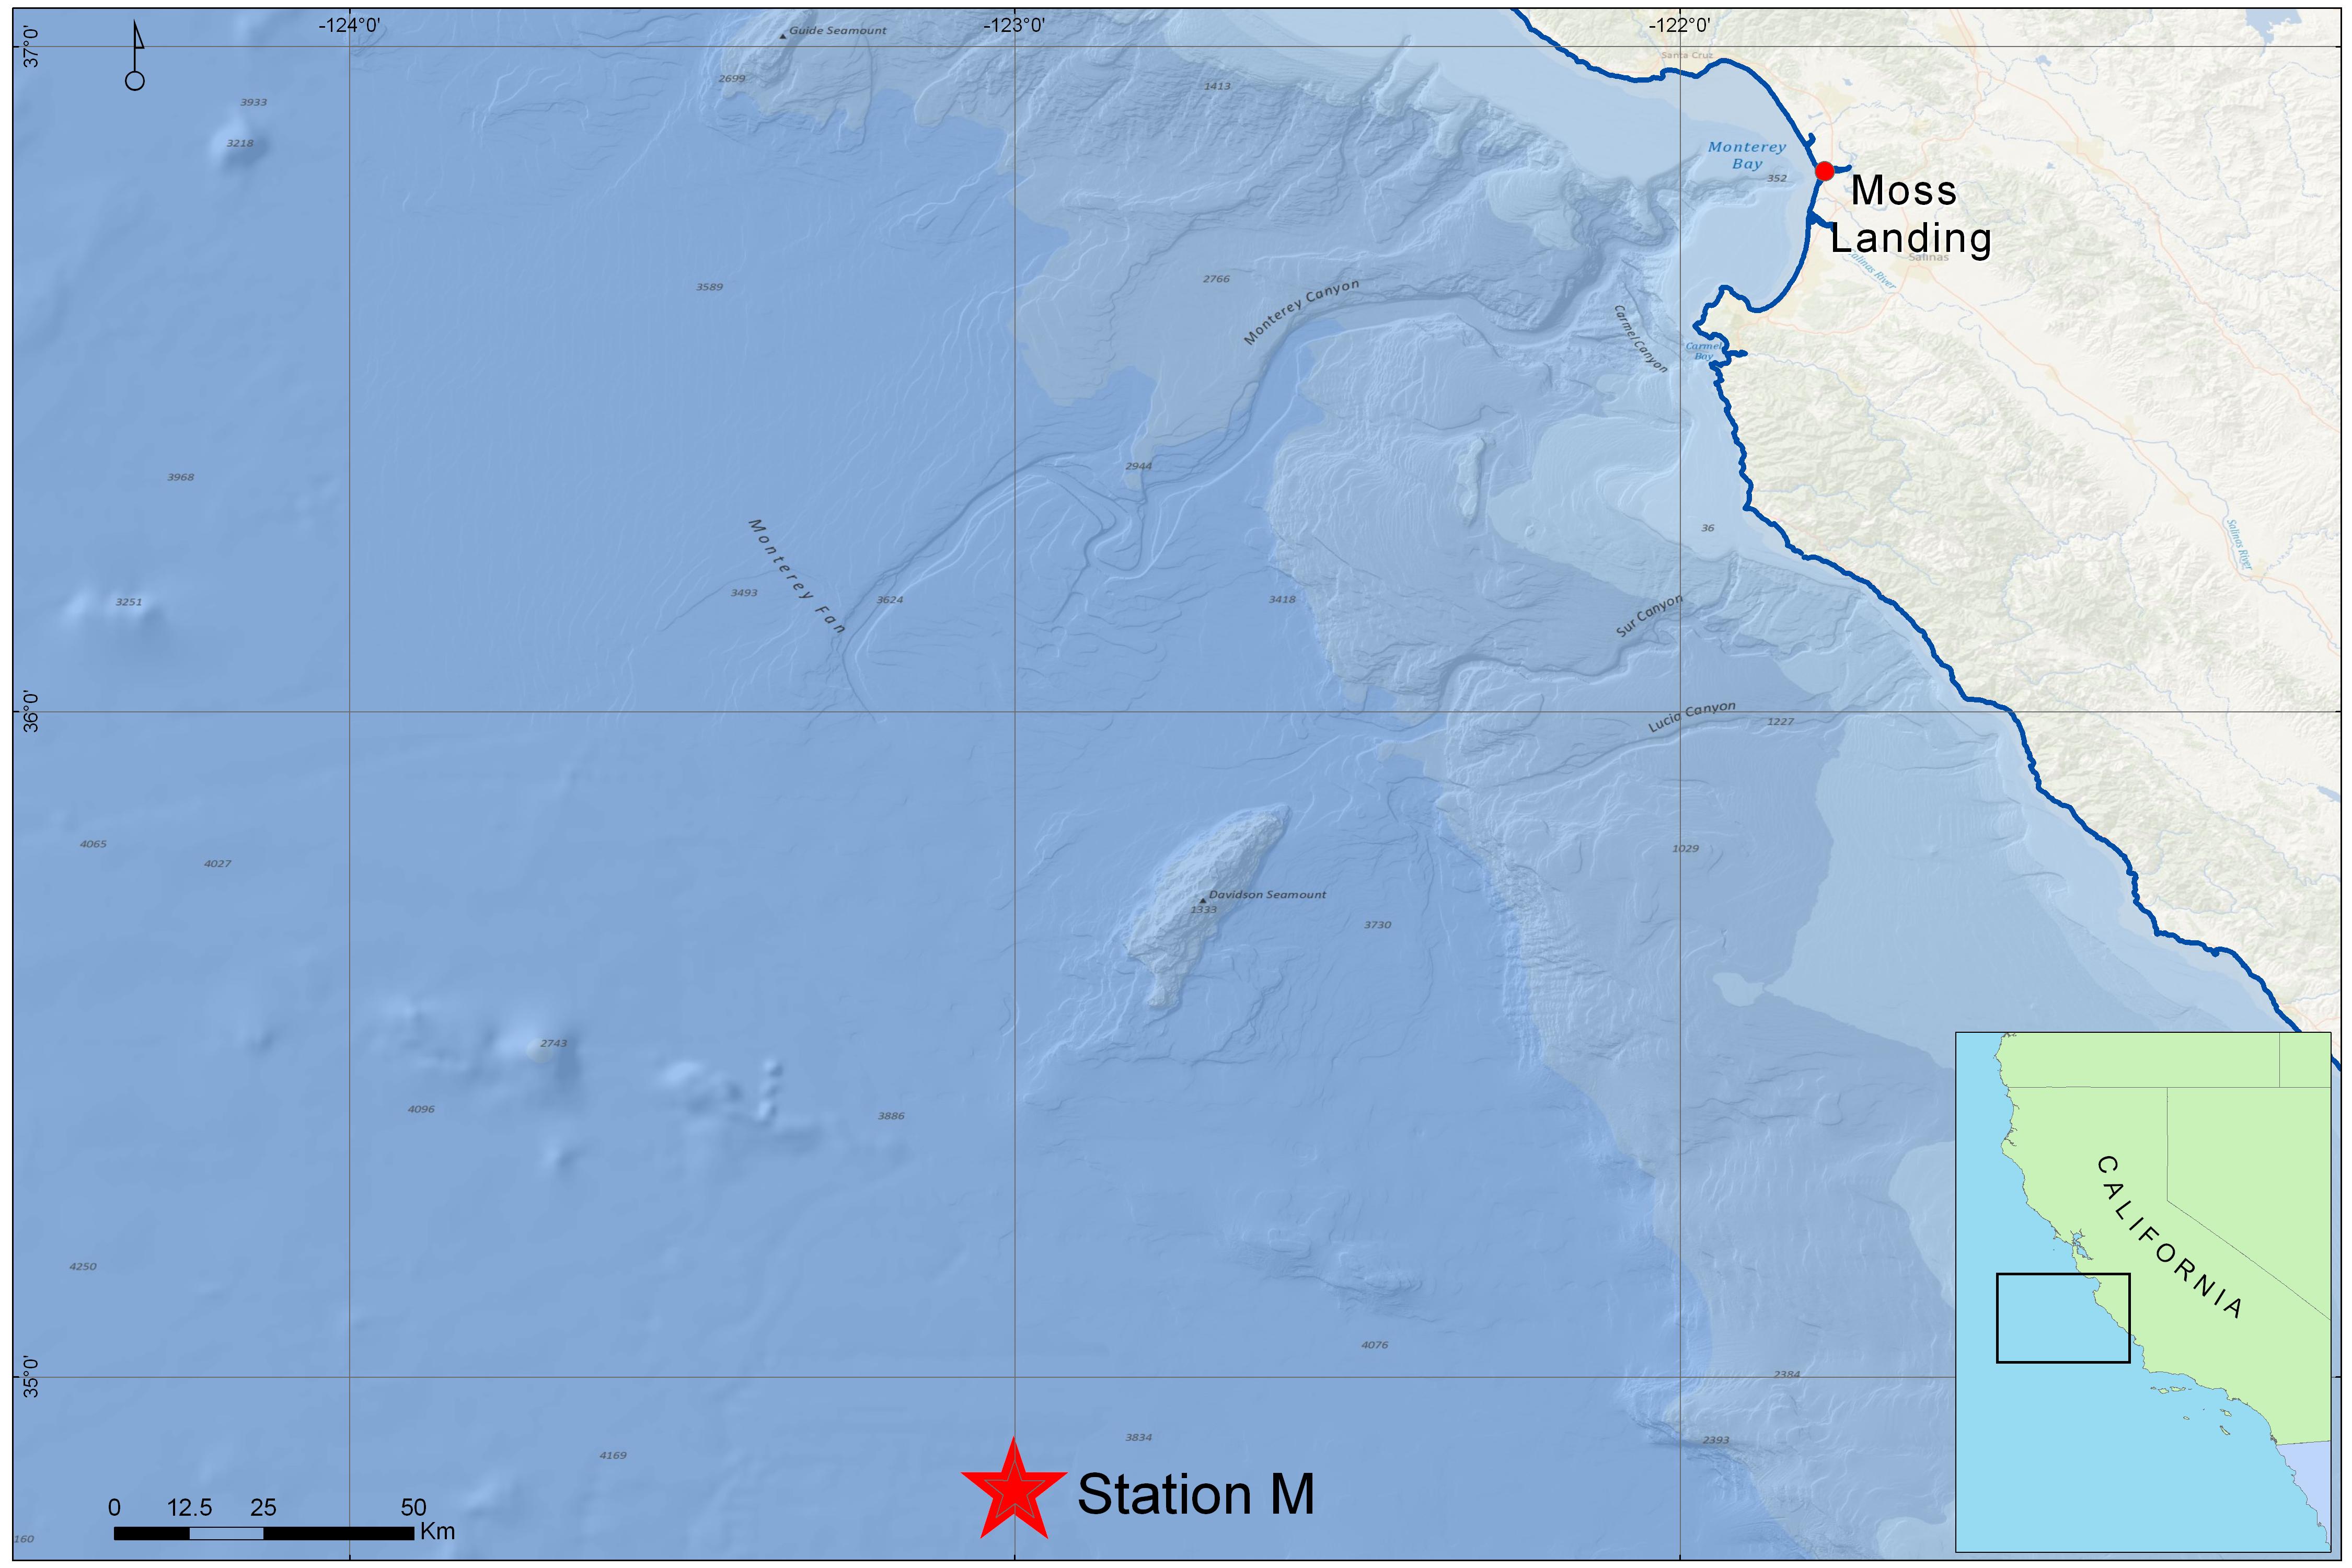 Station M map